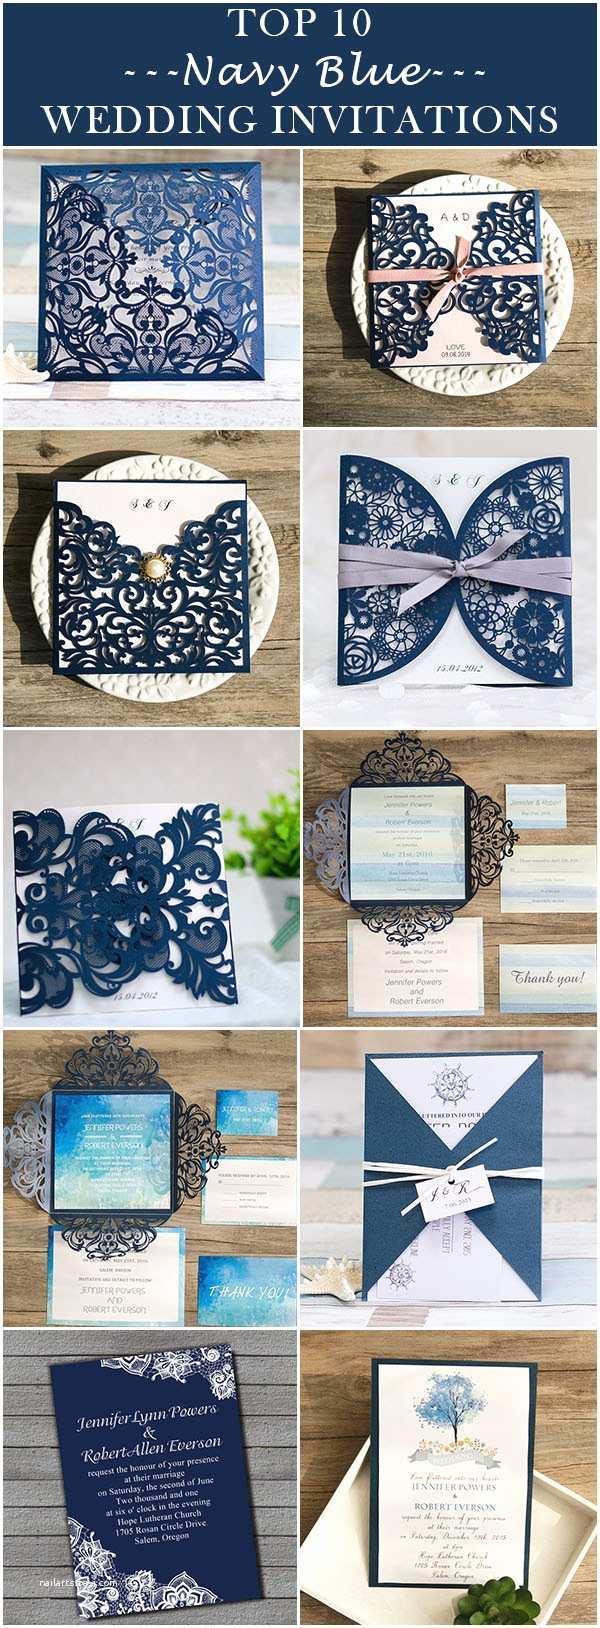 Navy Blue Wedding Invitations 10 Hottest Wedding Invitation Trends for 2016